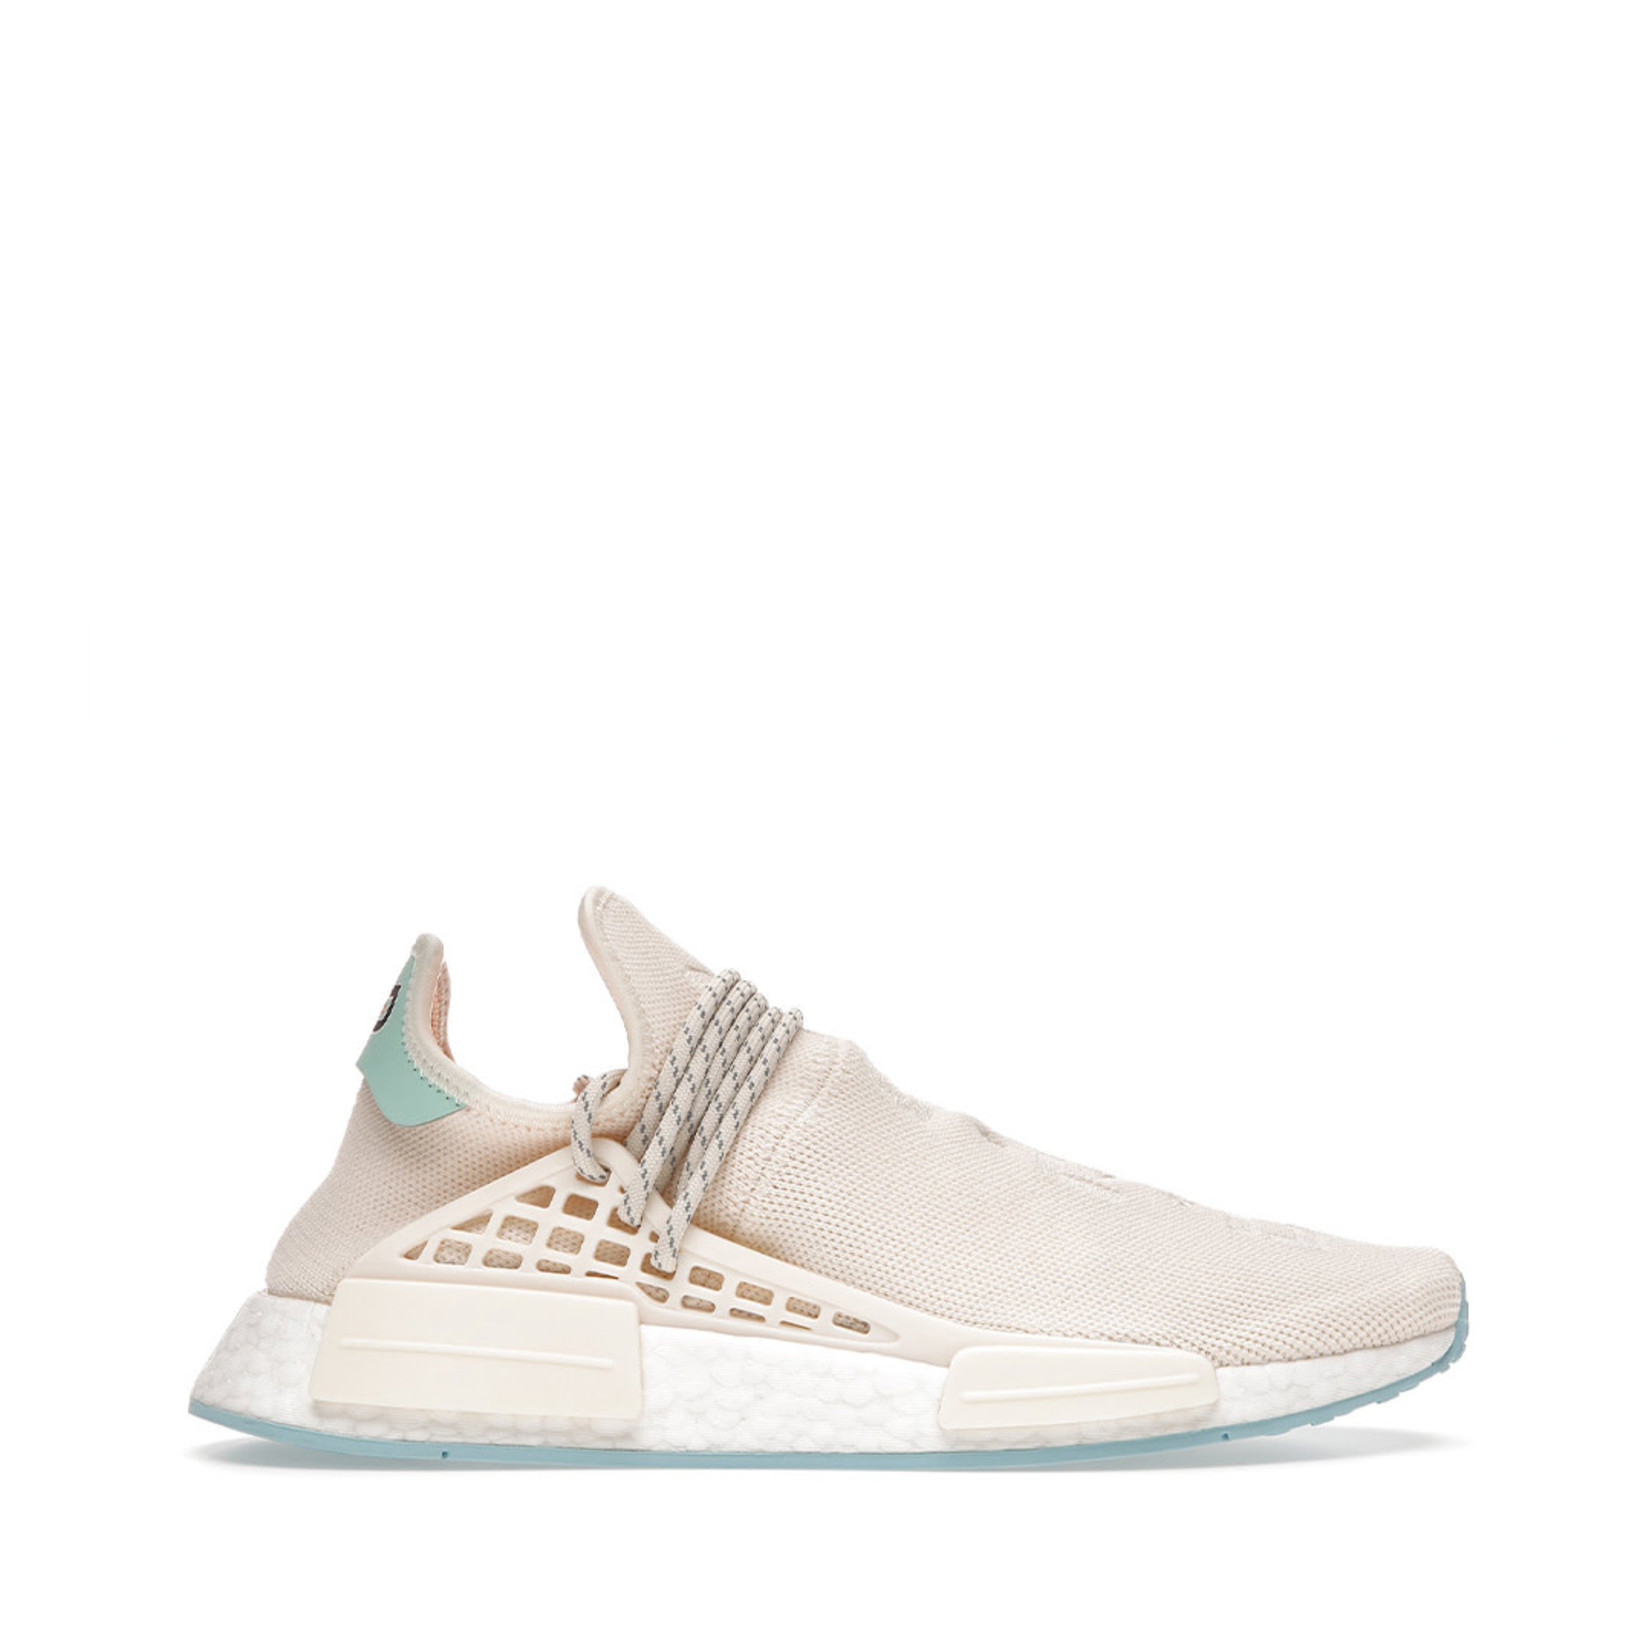 Adidas Adidas NMD HU Pharrell NERD